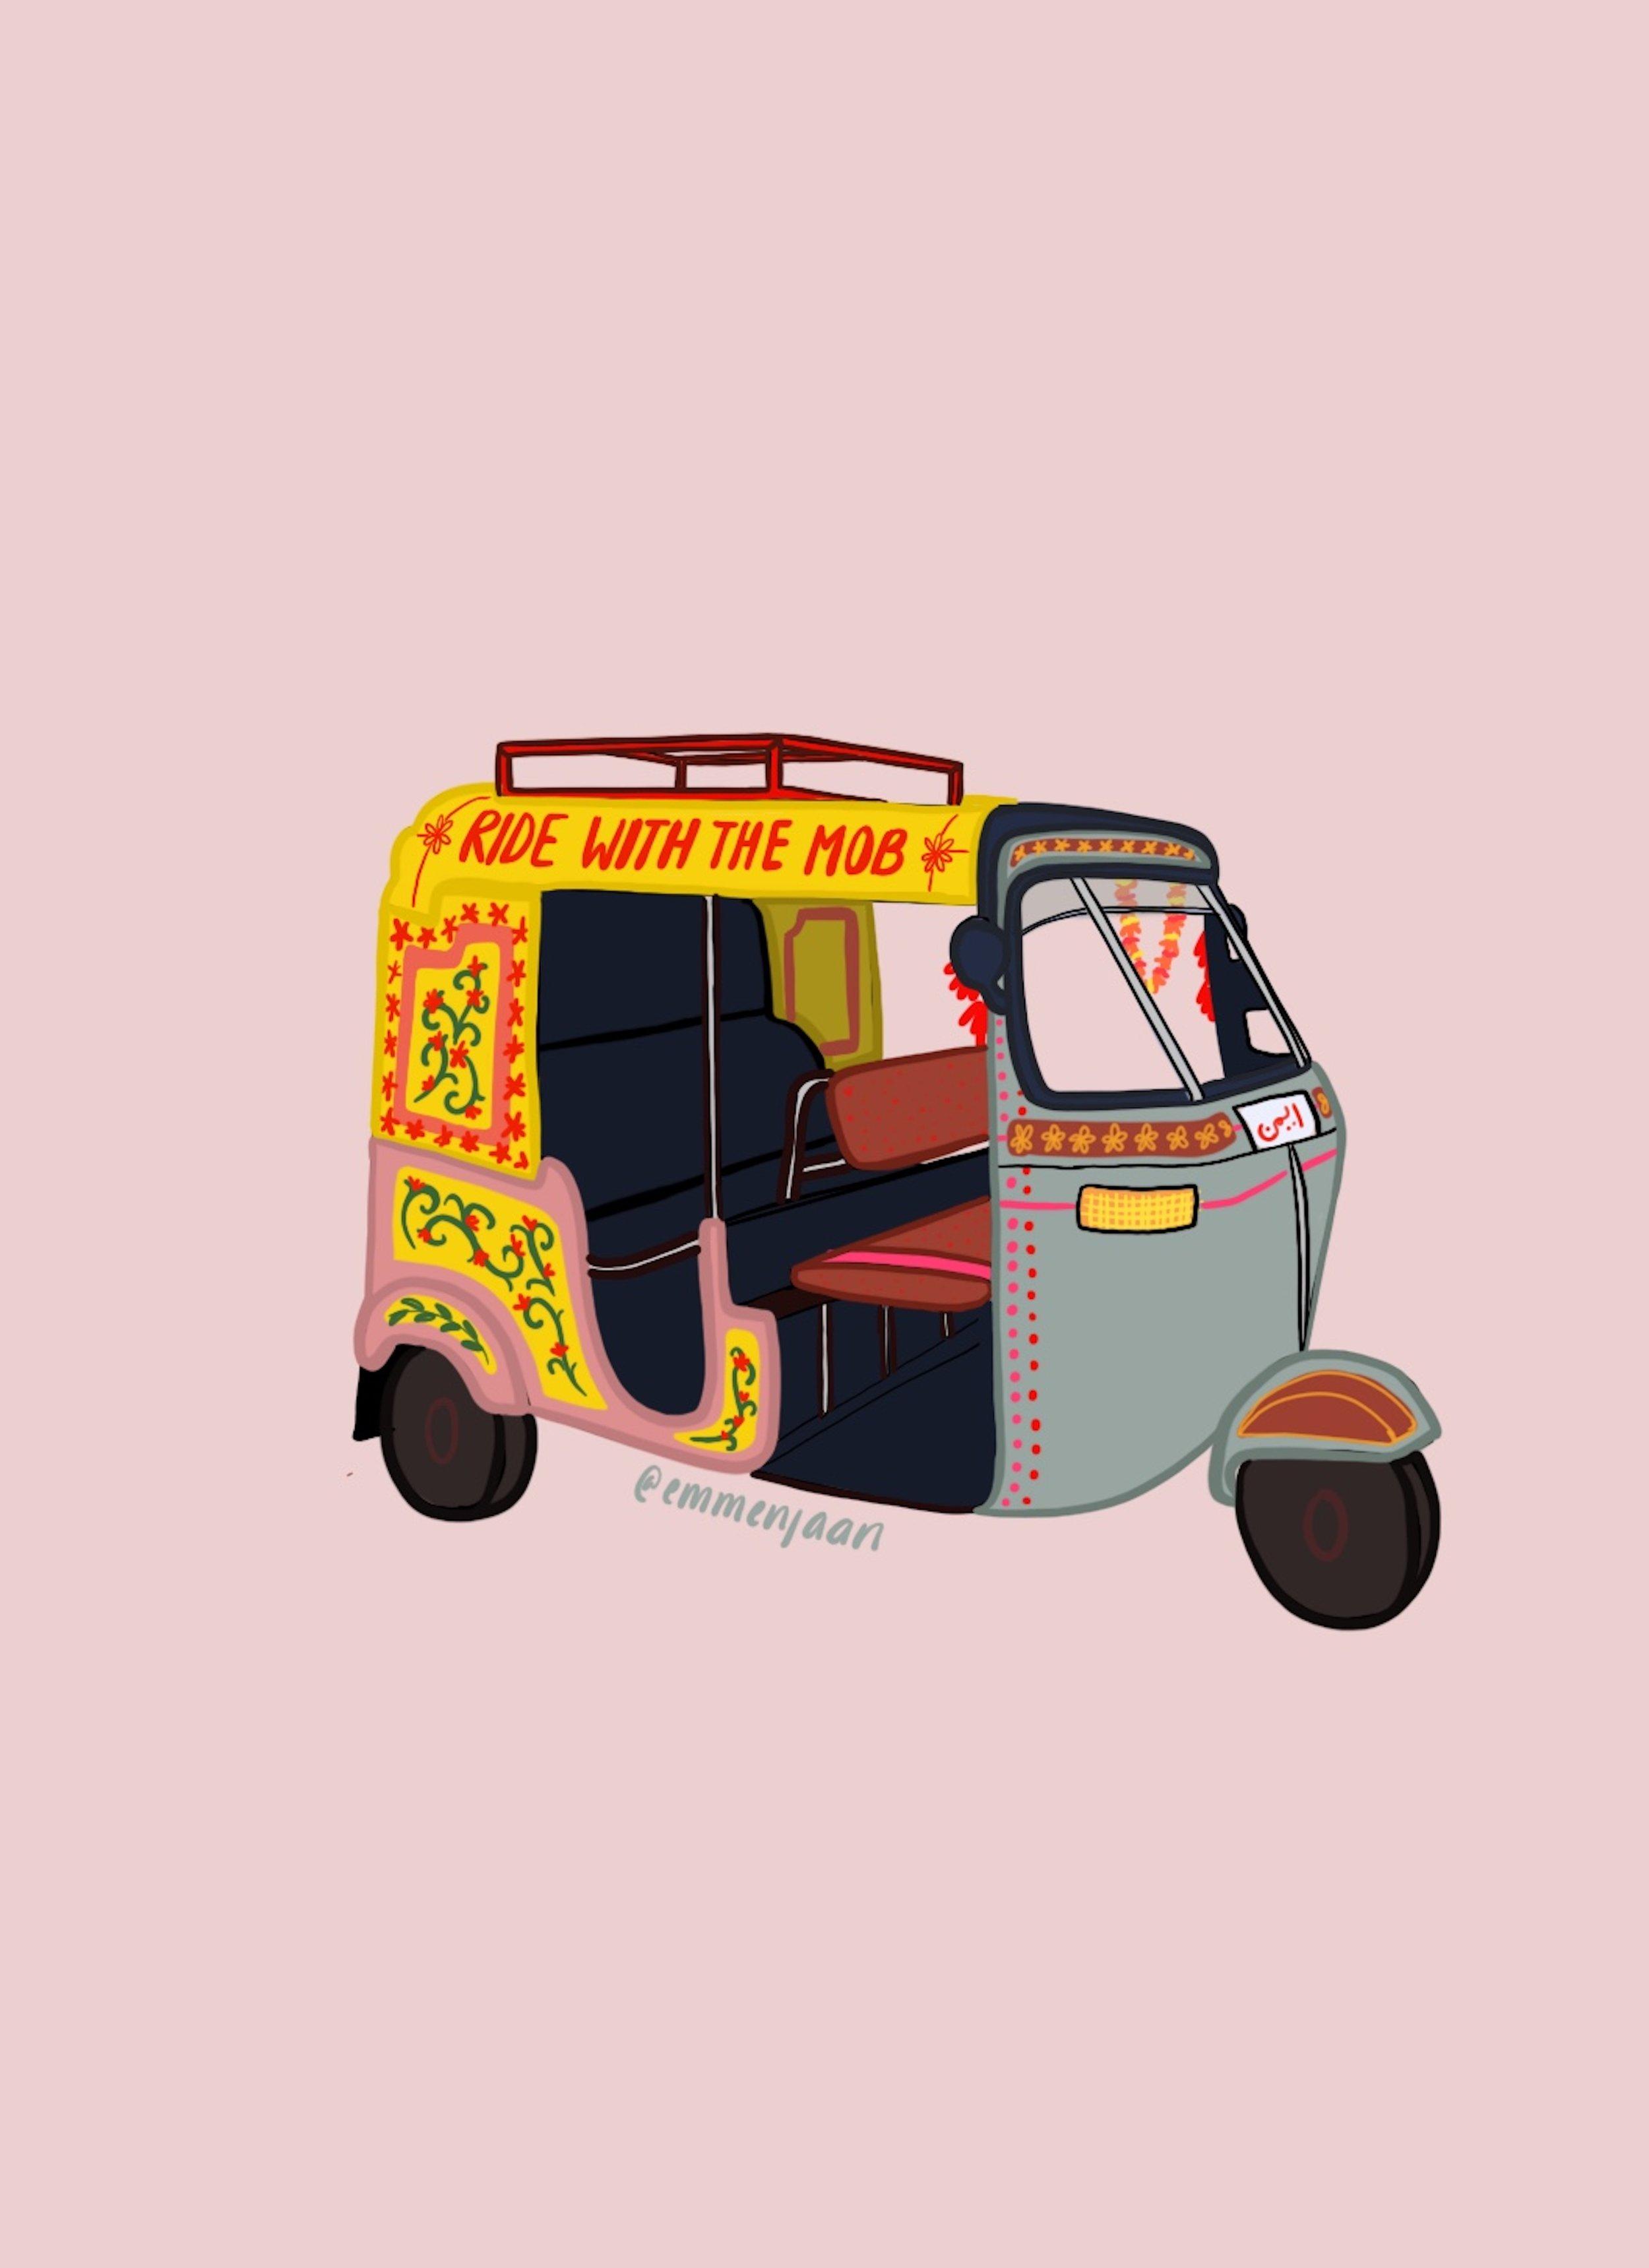 Rickshaw copy.JPG